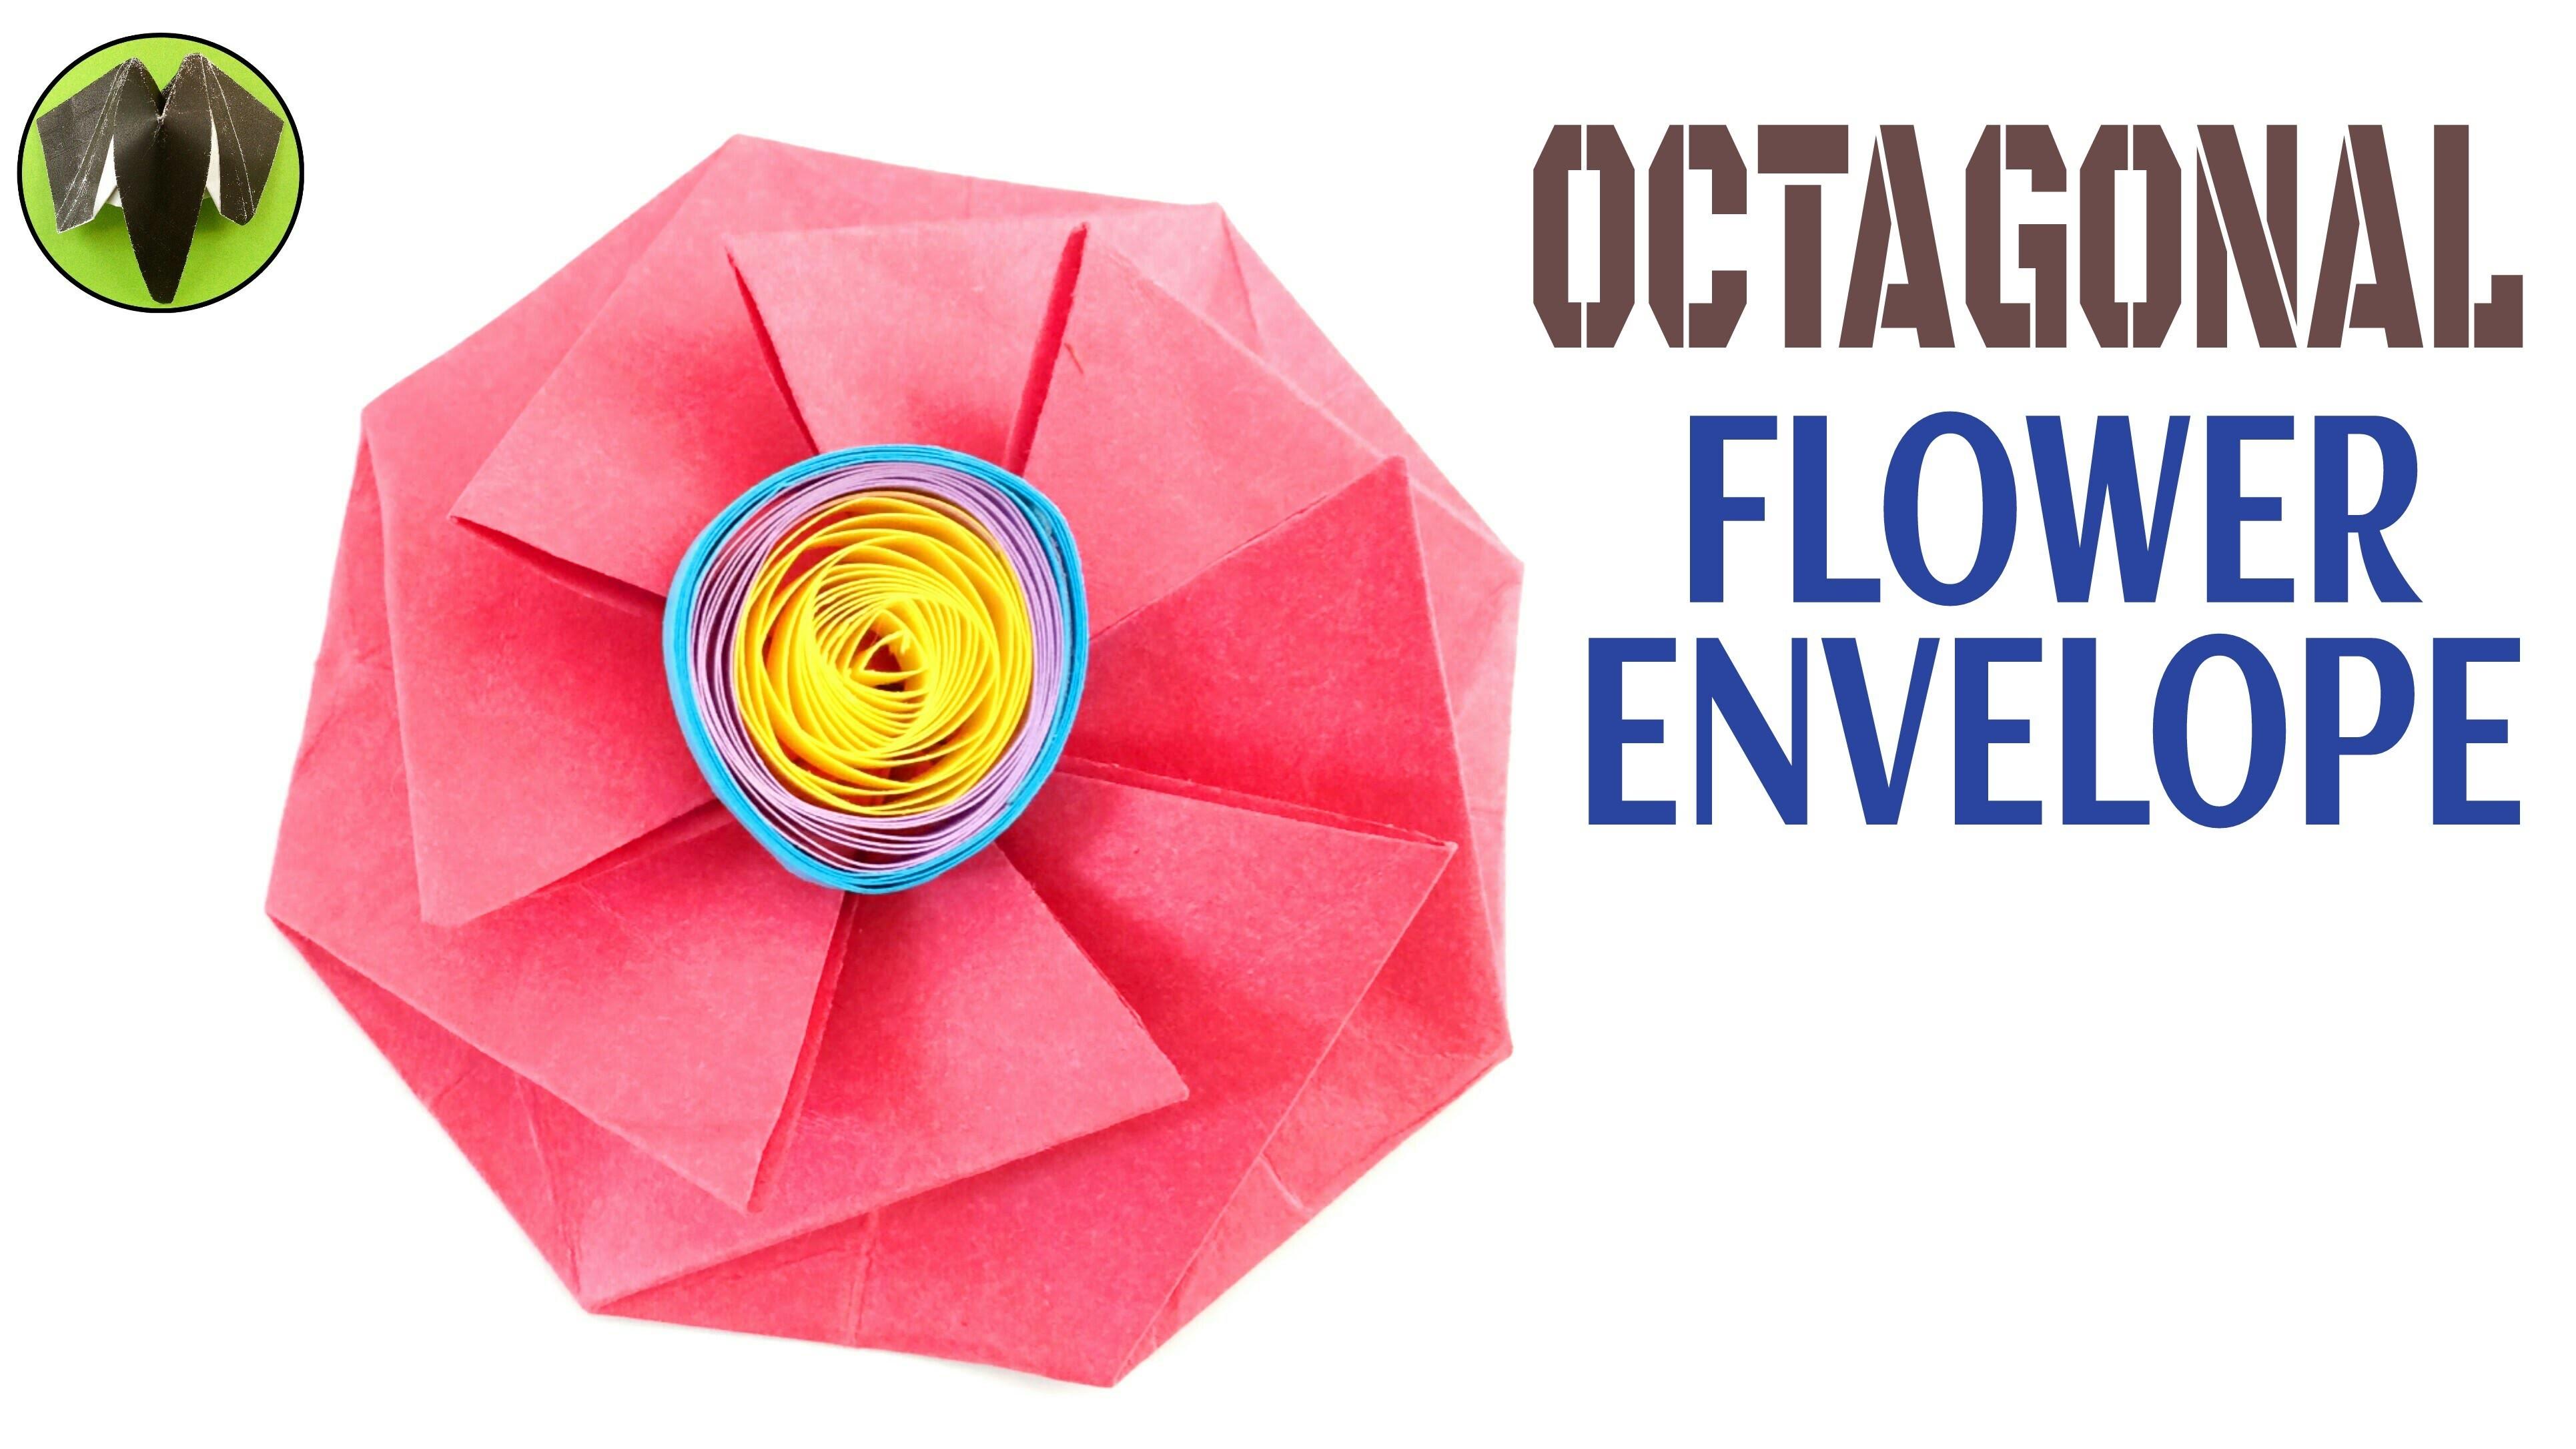 Origami Tutorial to make Paper Octagonal Flower Envelope ... - photo#31